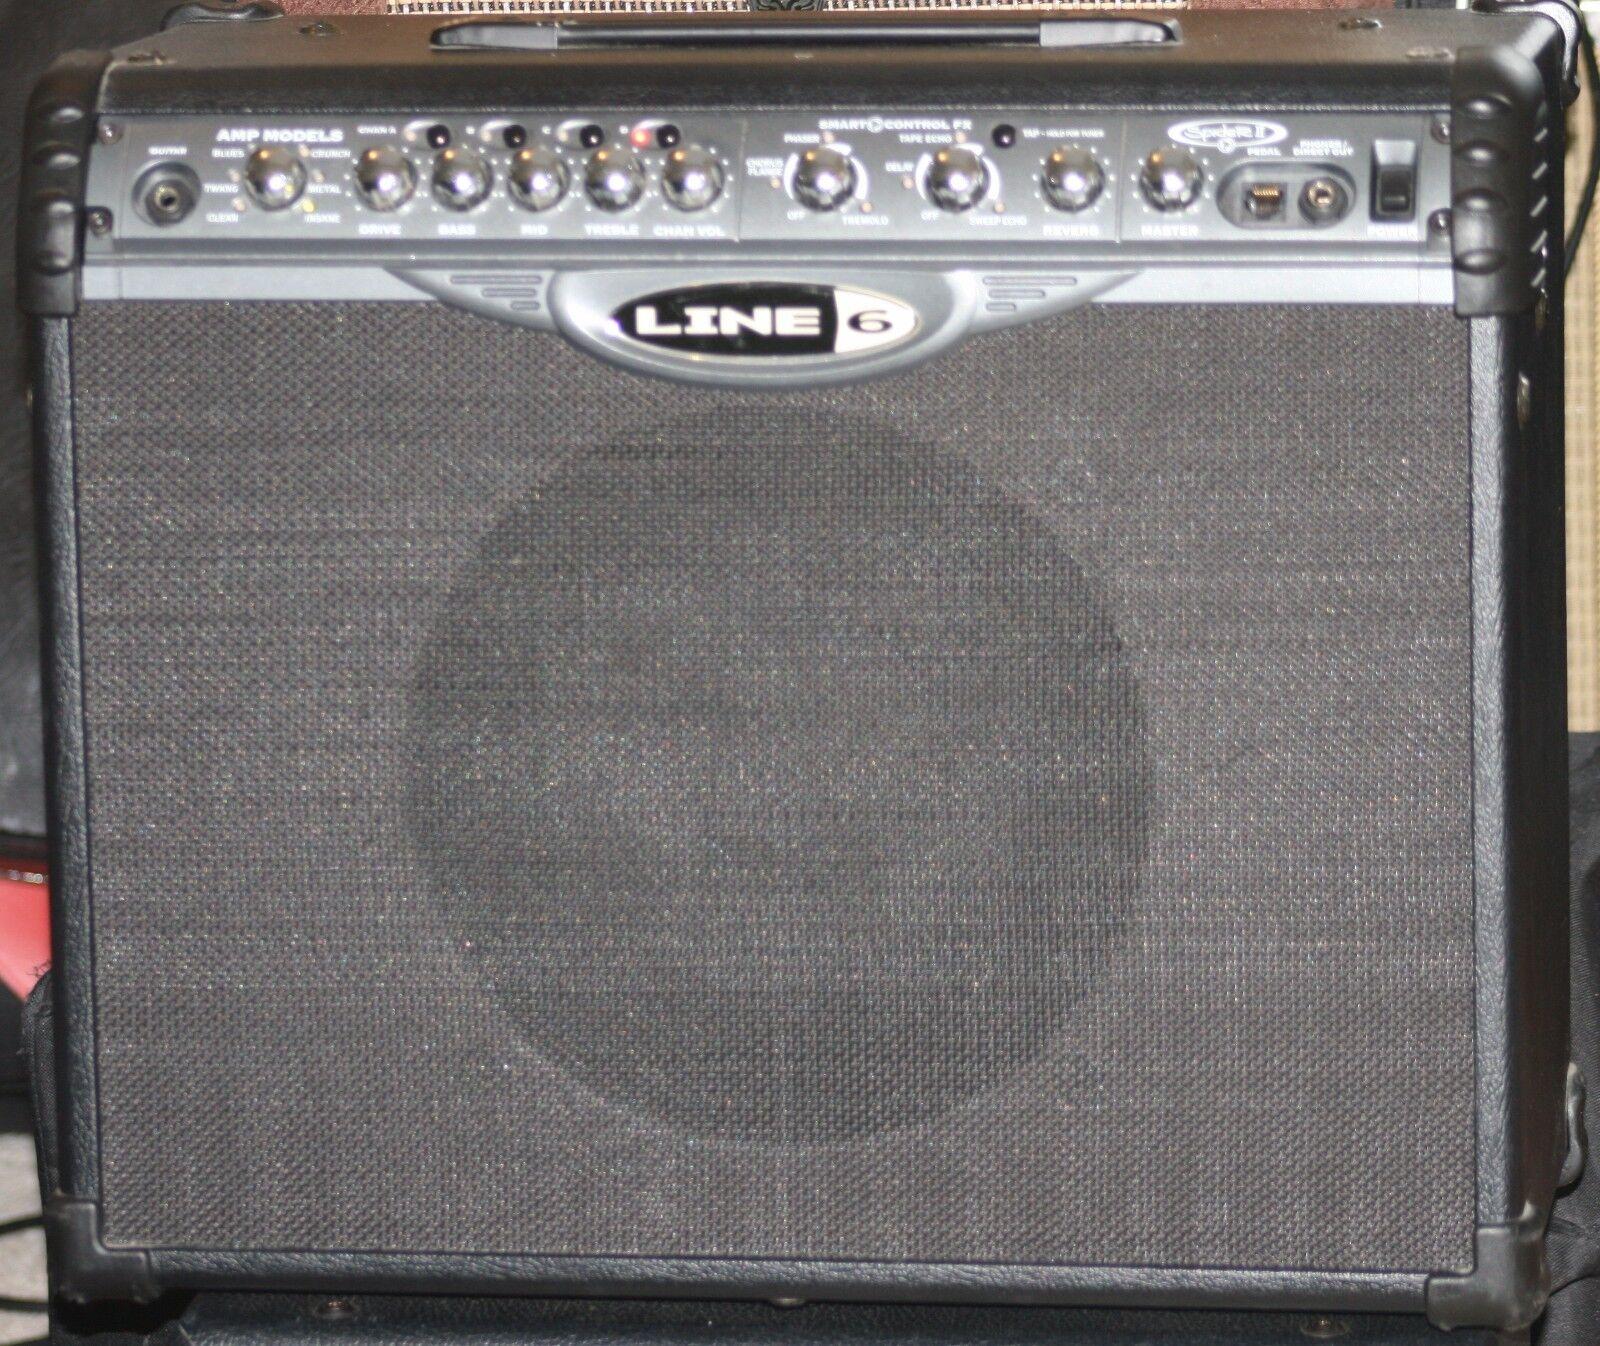 Line 6 Spider II 75 Watts 1x12 Combo Amplifier.Amp models.Effects.Celestion